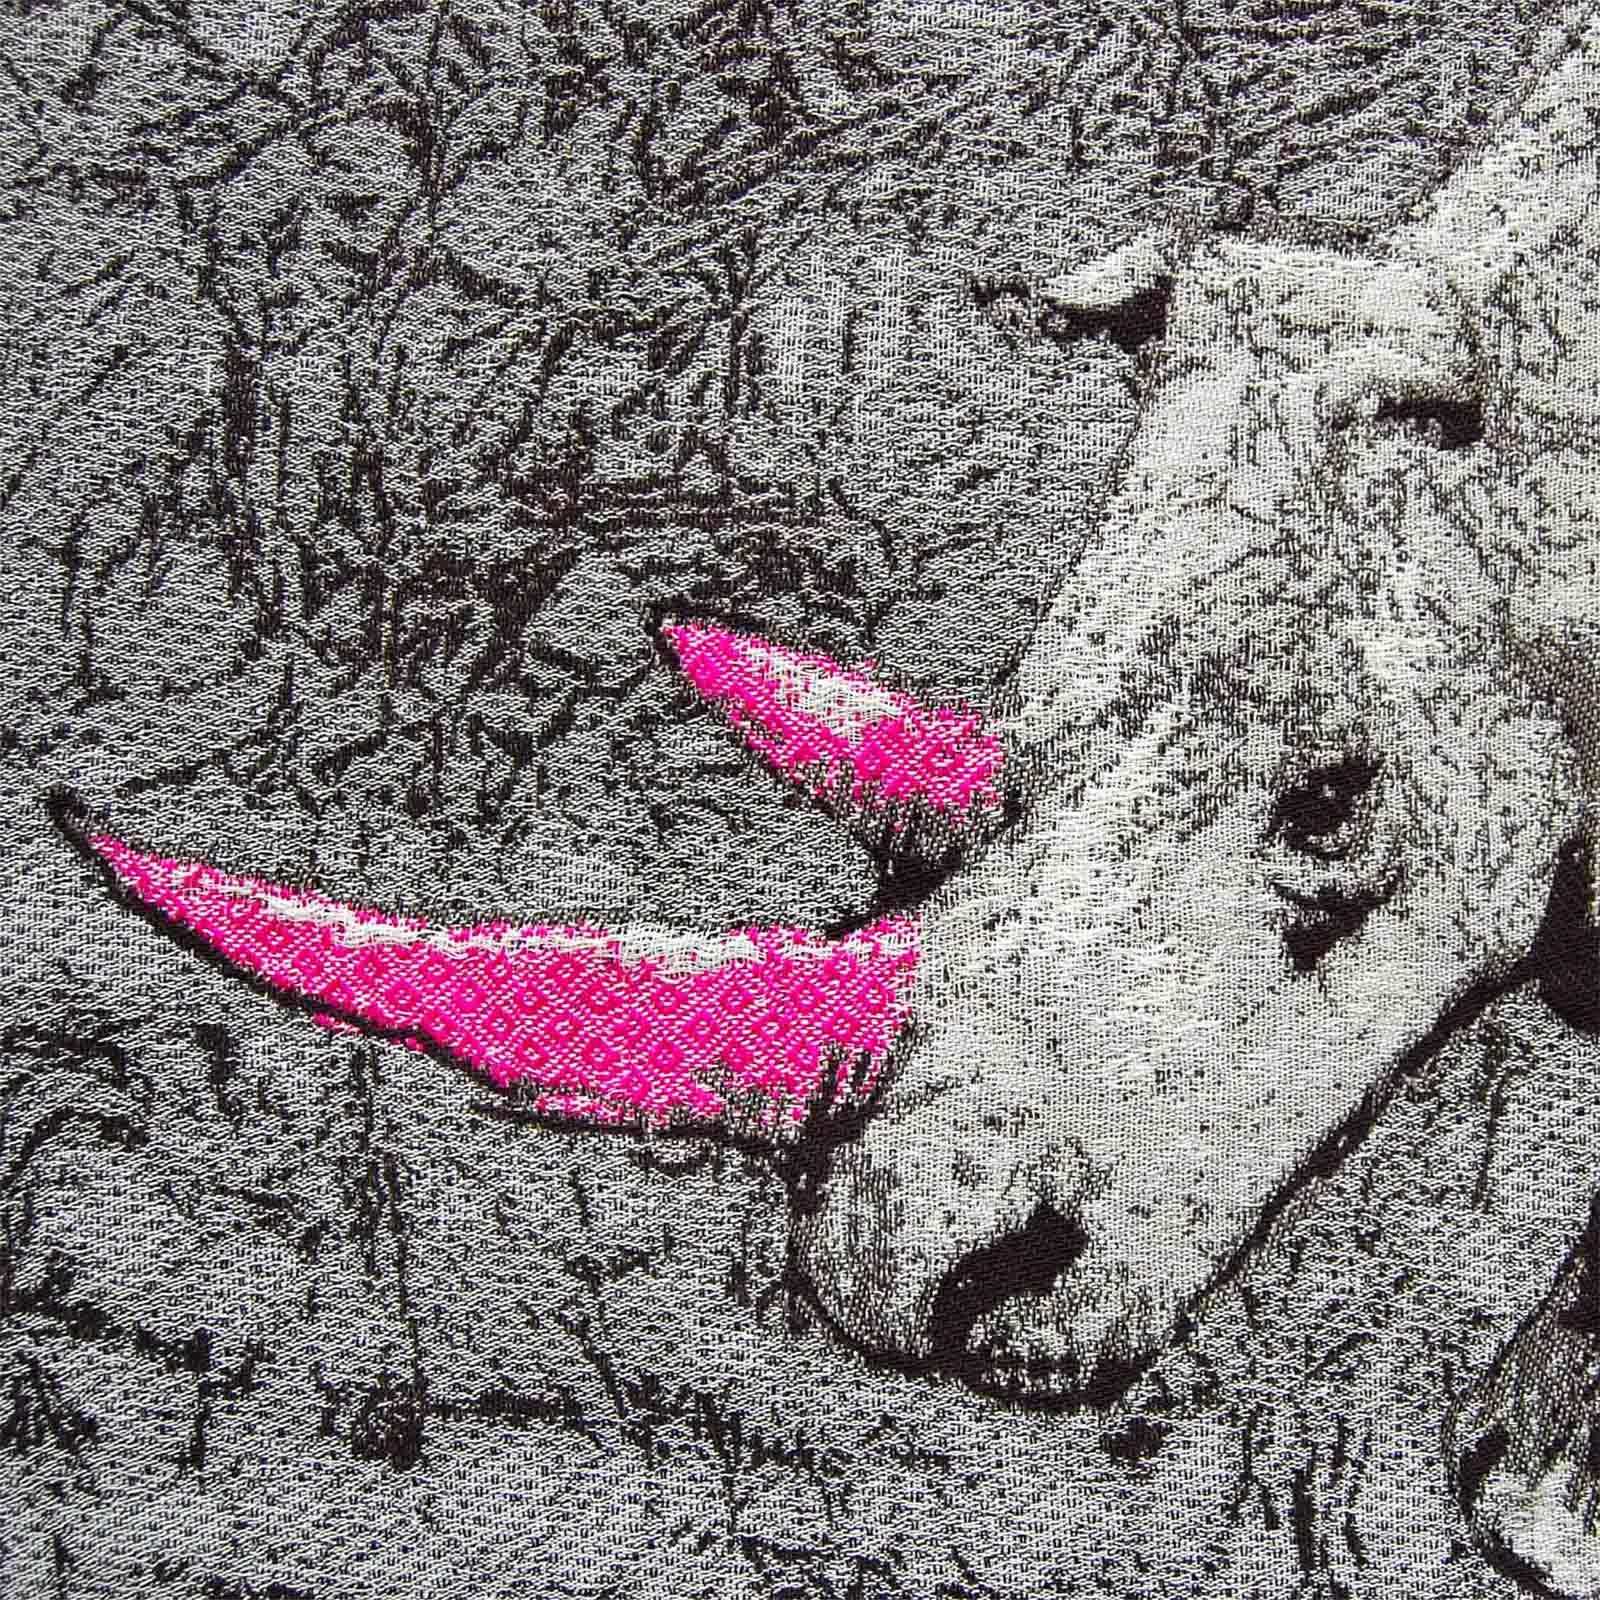 Copy of Copy of Copy of Black Rhino, Diceros bicornis